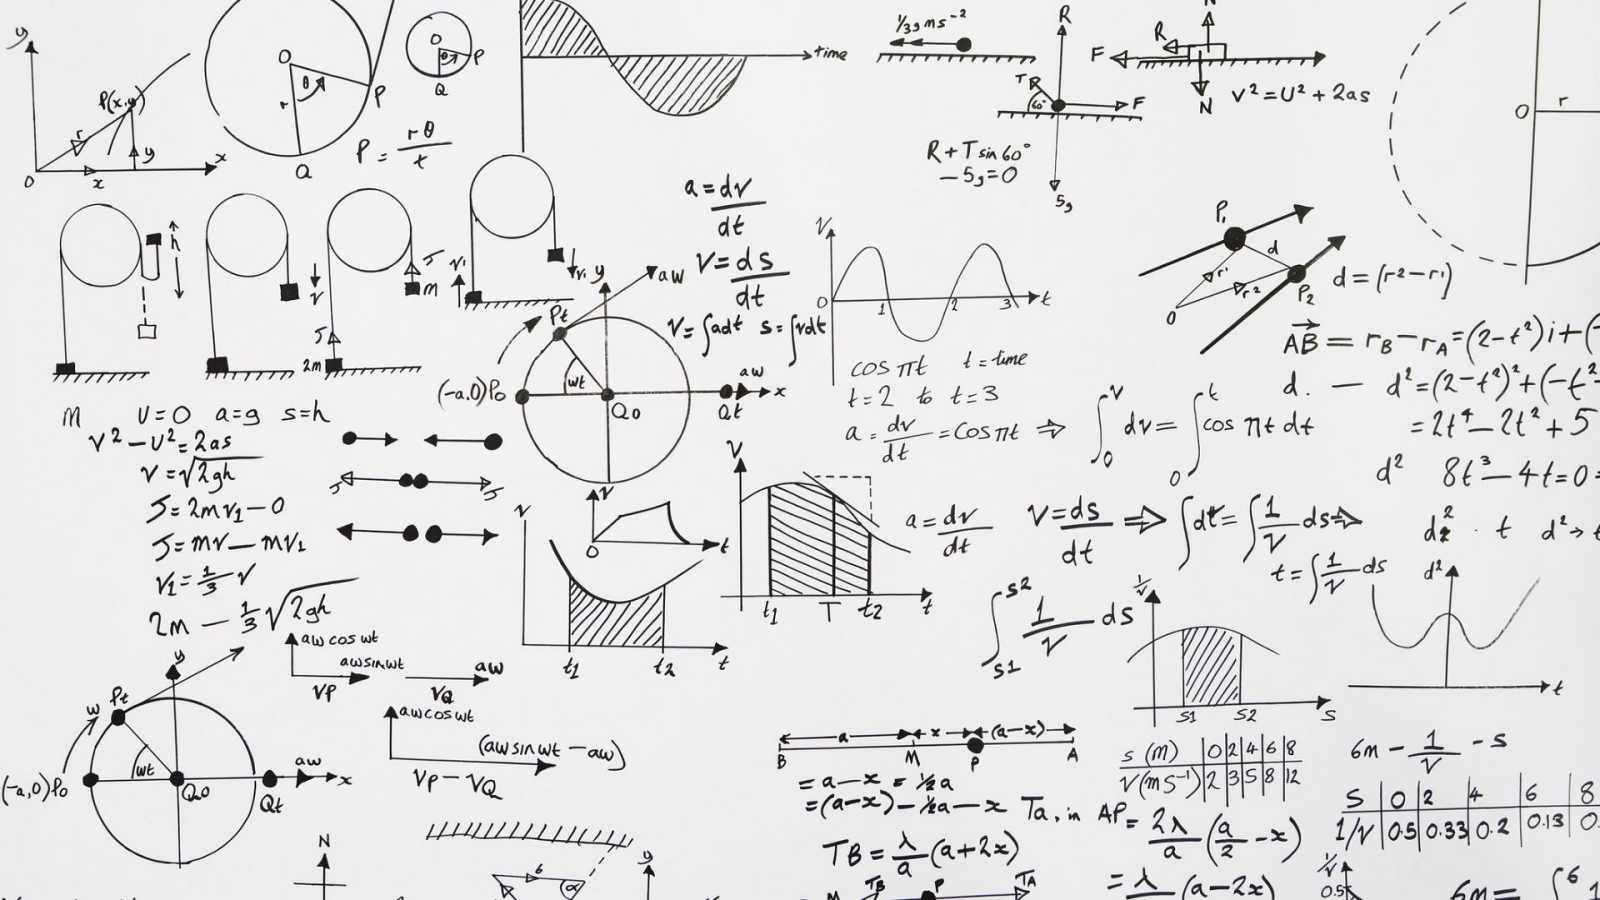 Raíz de 5 - Historias extraordinarias de Matemáticas - 13/07/20 - escuchar ahora